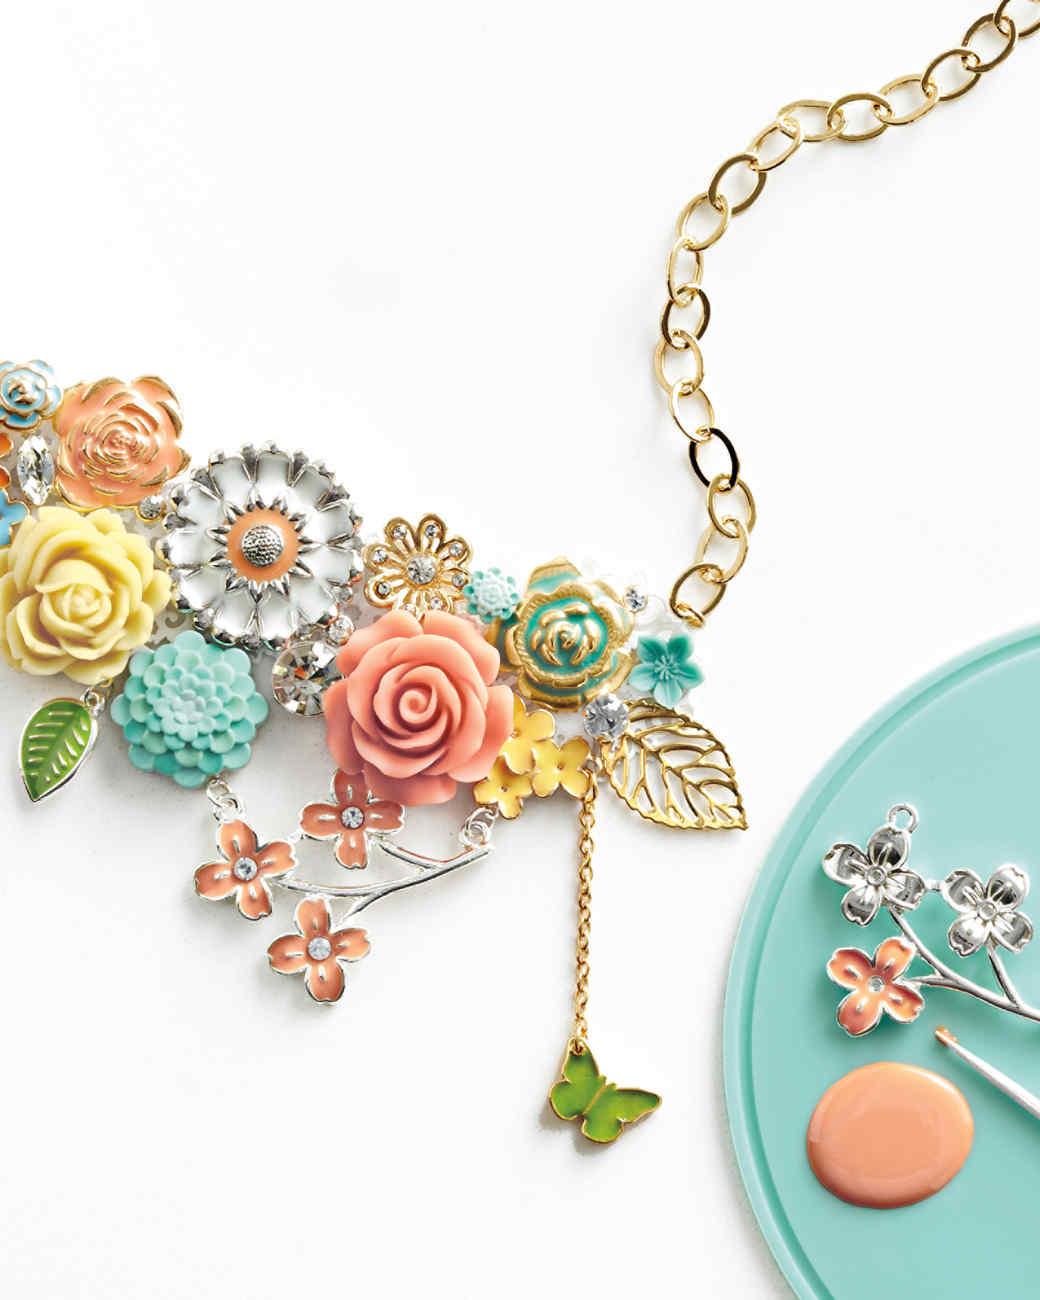 Make It Yours: Martha Stewart Crafts Jewelry